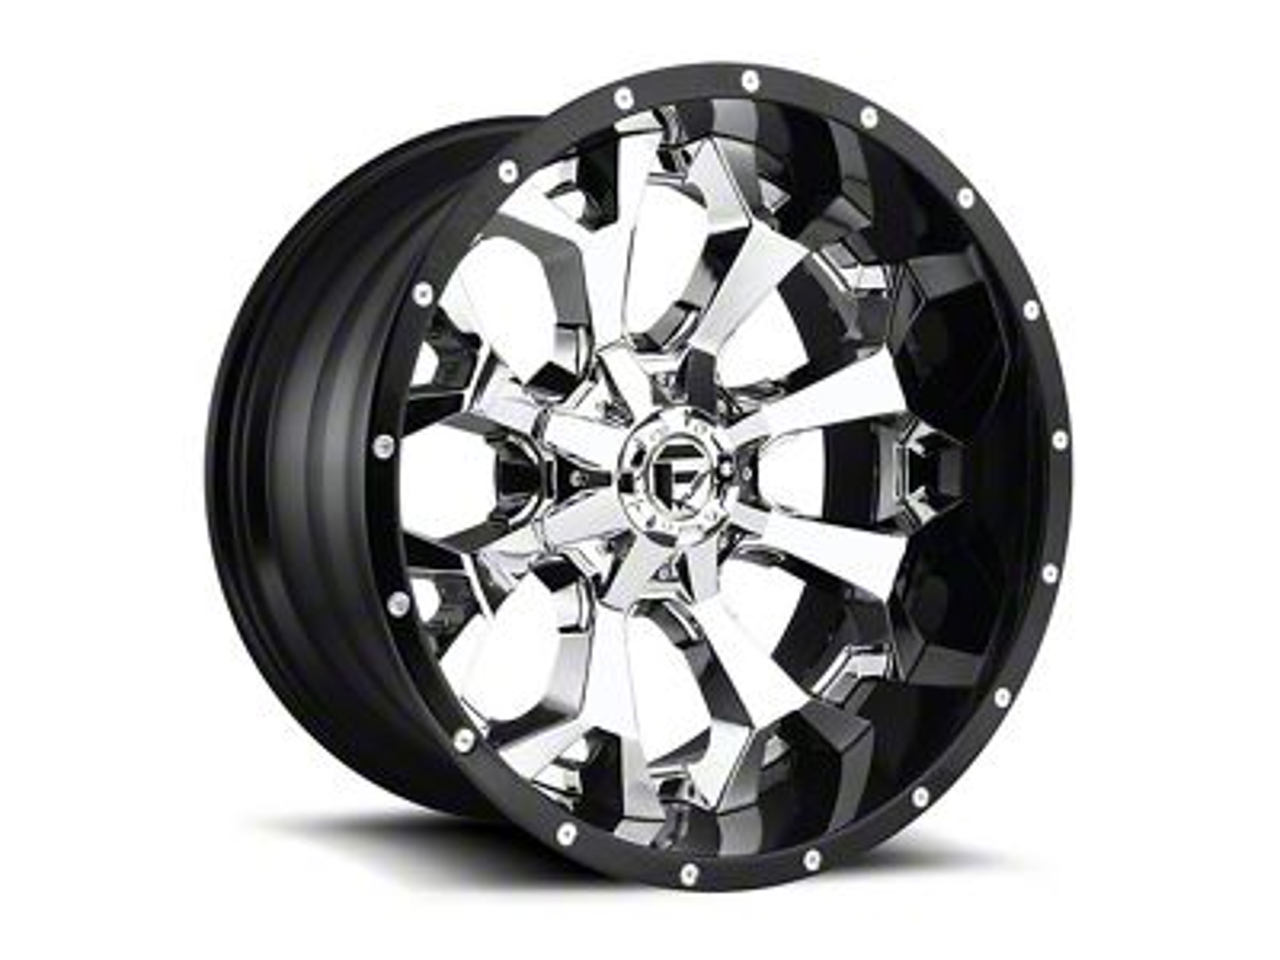 Fuel Wheels Assault Chrome 6-Lug Wheel - 22x14 (07-18 Sierra 1500)